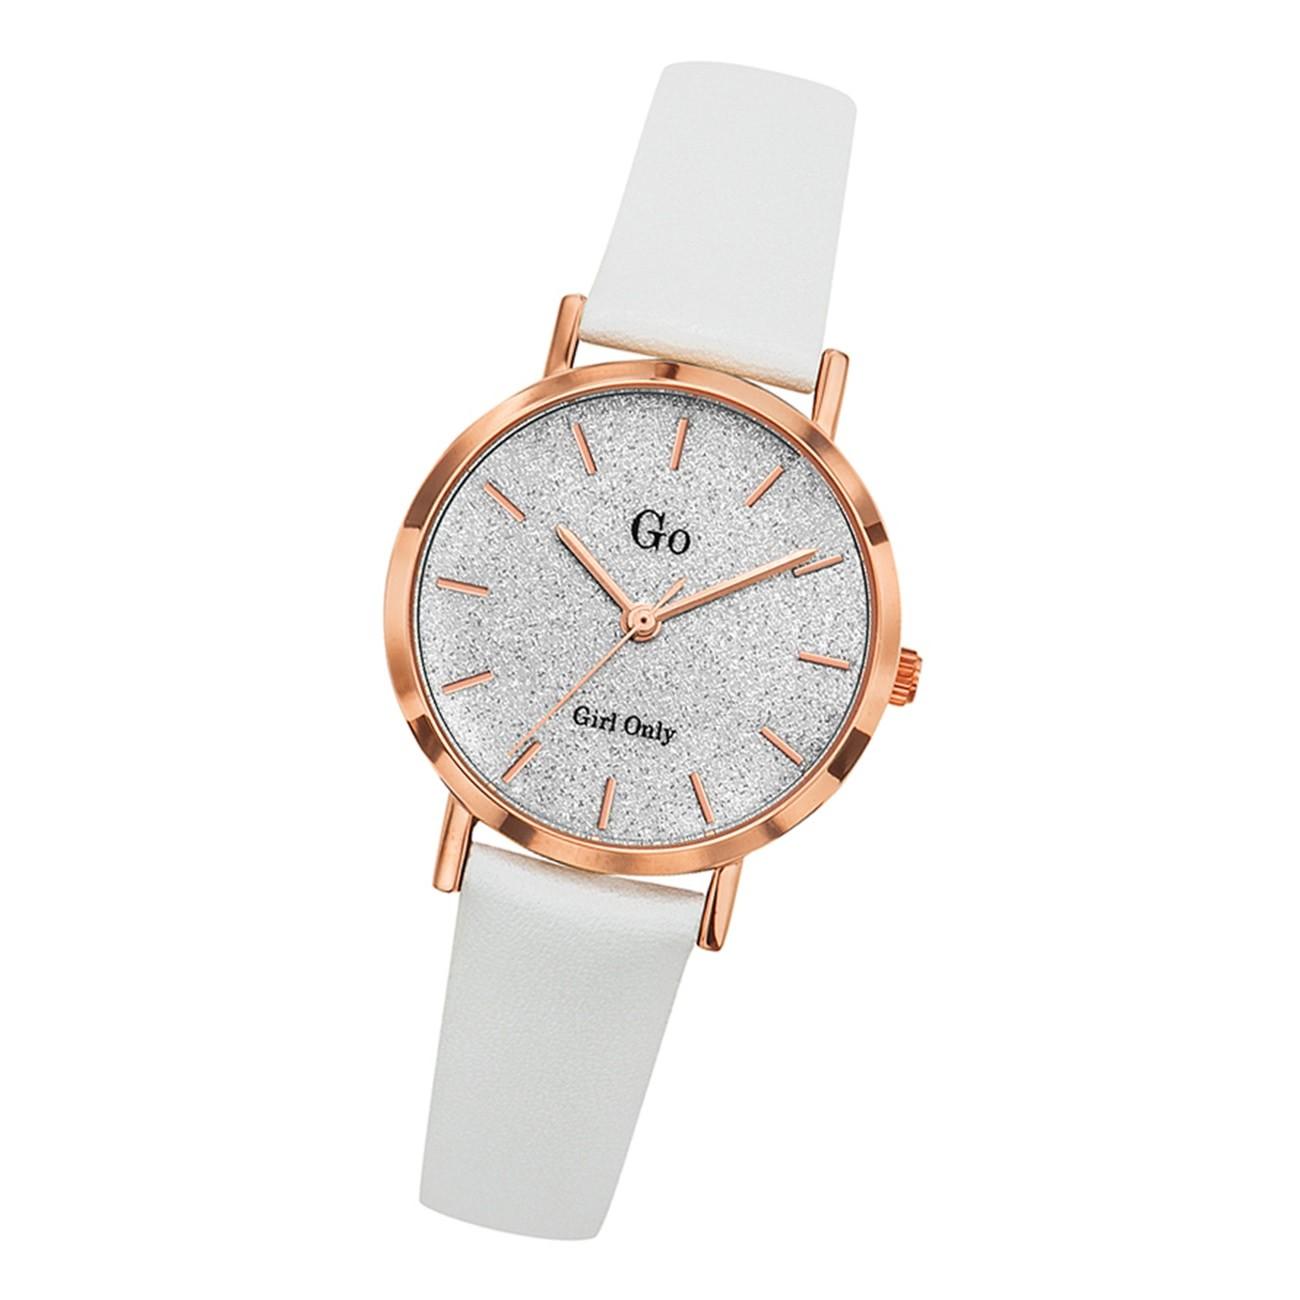 Girl Only Damen Armbanduhr GO 699901 Analog Quarz Uhr Leder weiß UGO699901